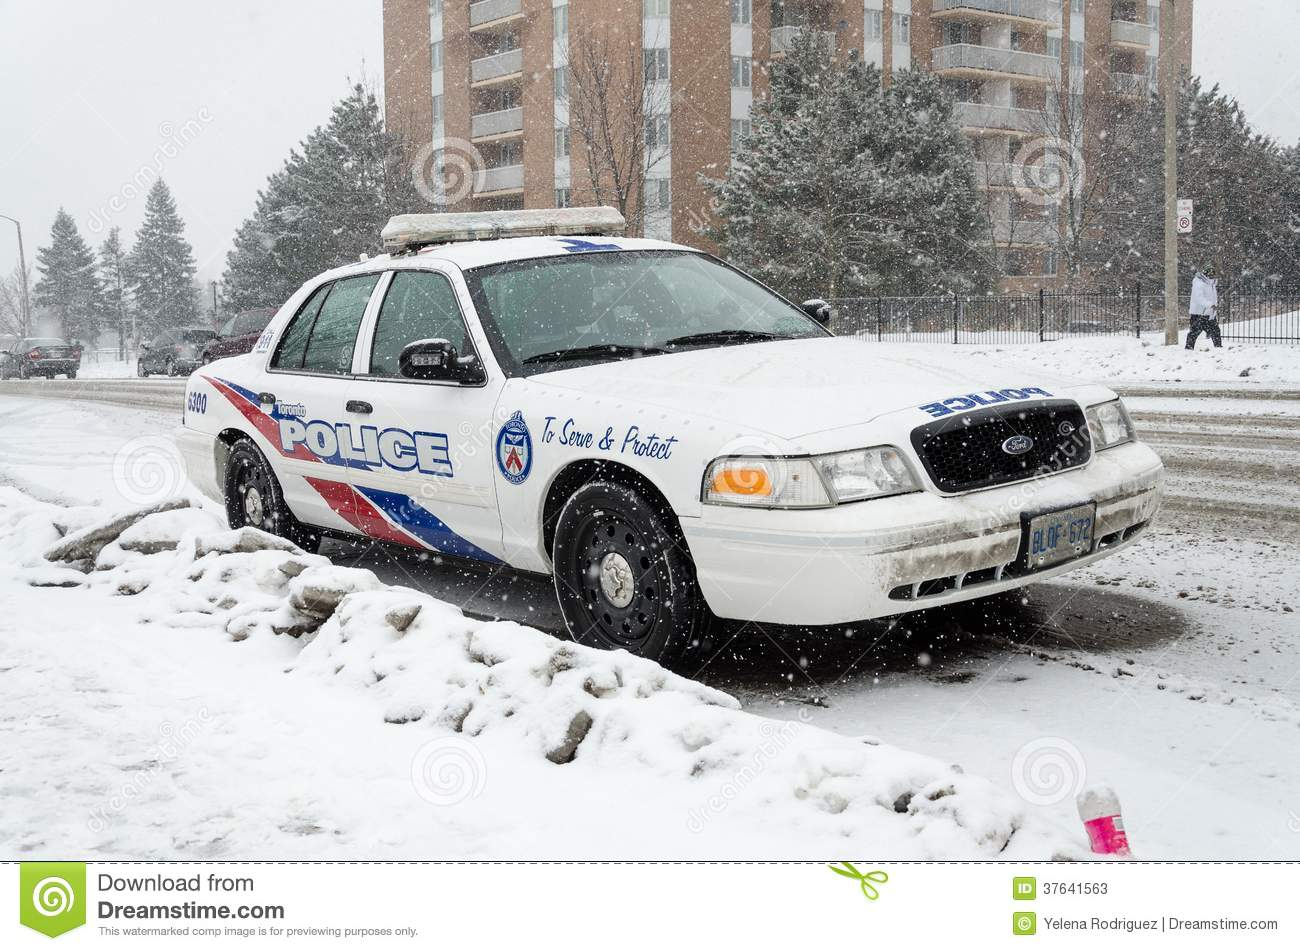 Police car snow clipart jpg transparent library Police car in snow clipart - ClipartFest jpg transparent library